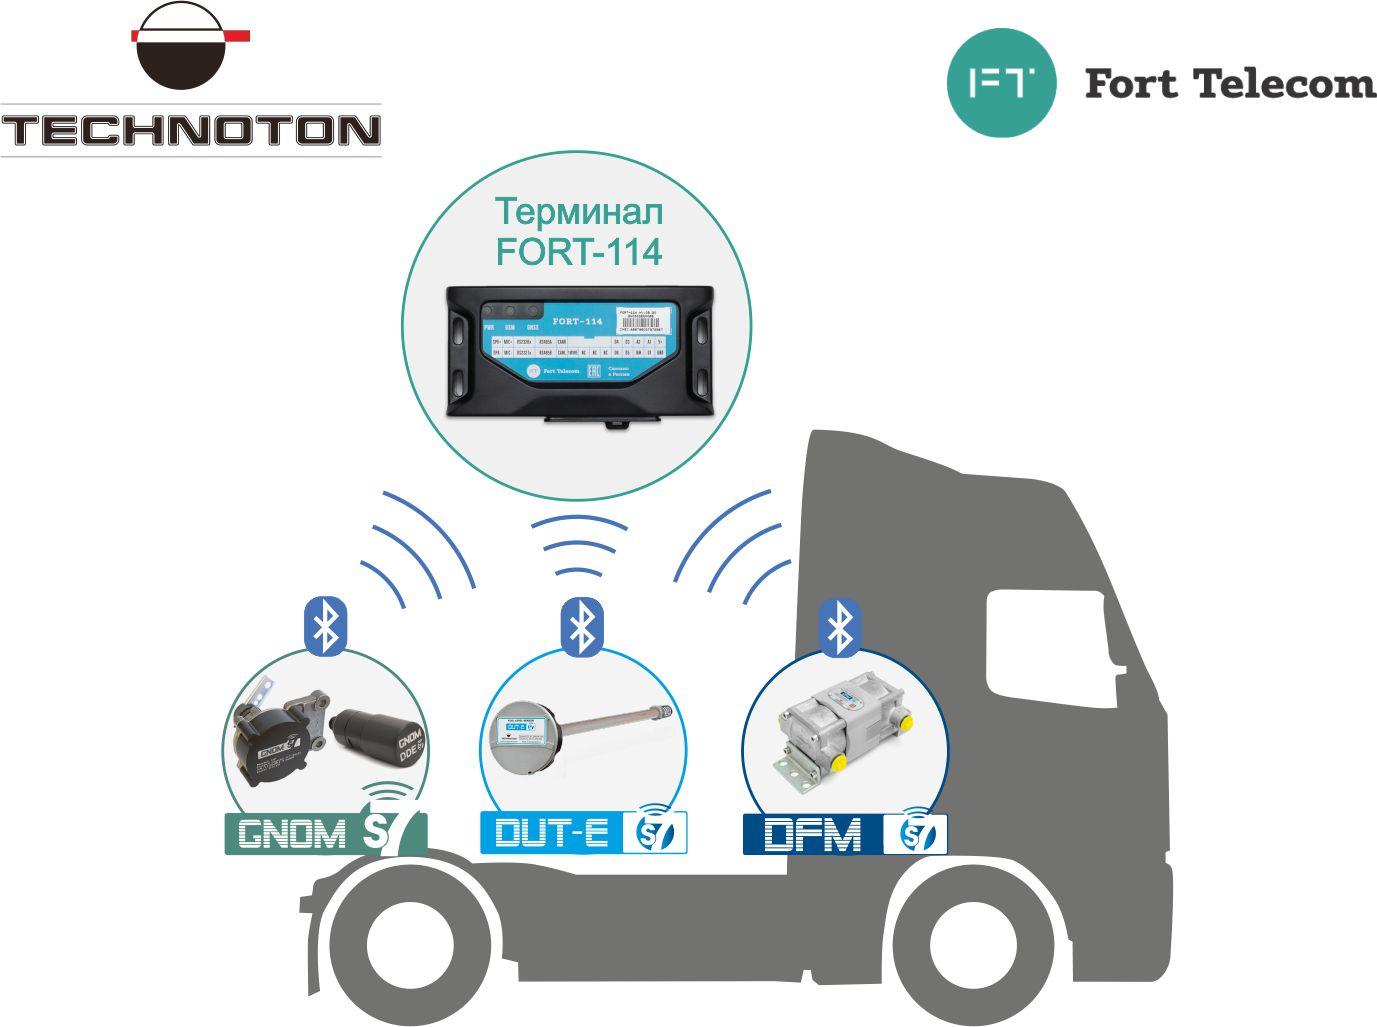 Мониторинг грузовика с помощью BLE-датчиков Технотон и терминала Форт Телеком